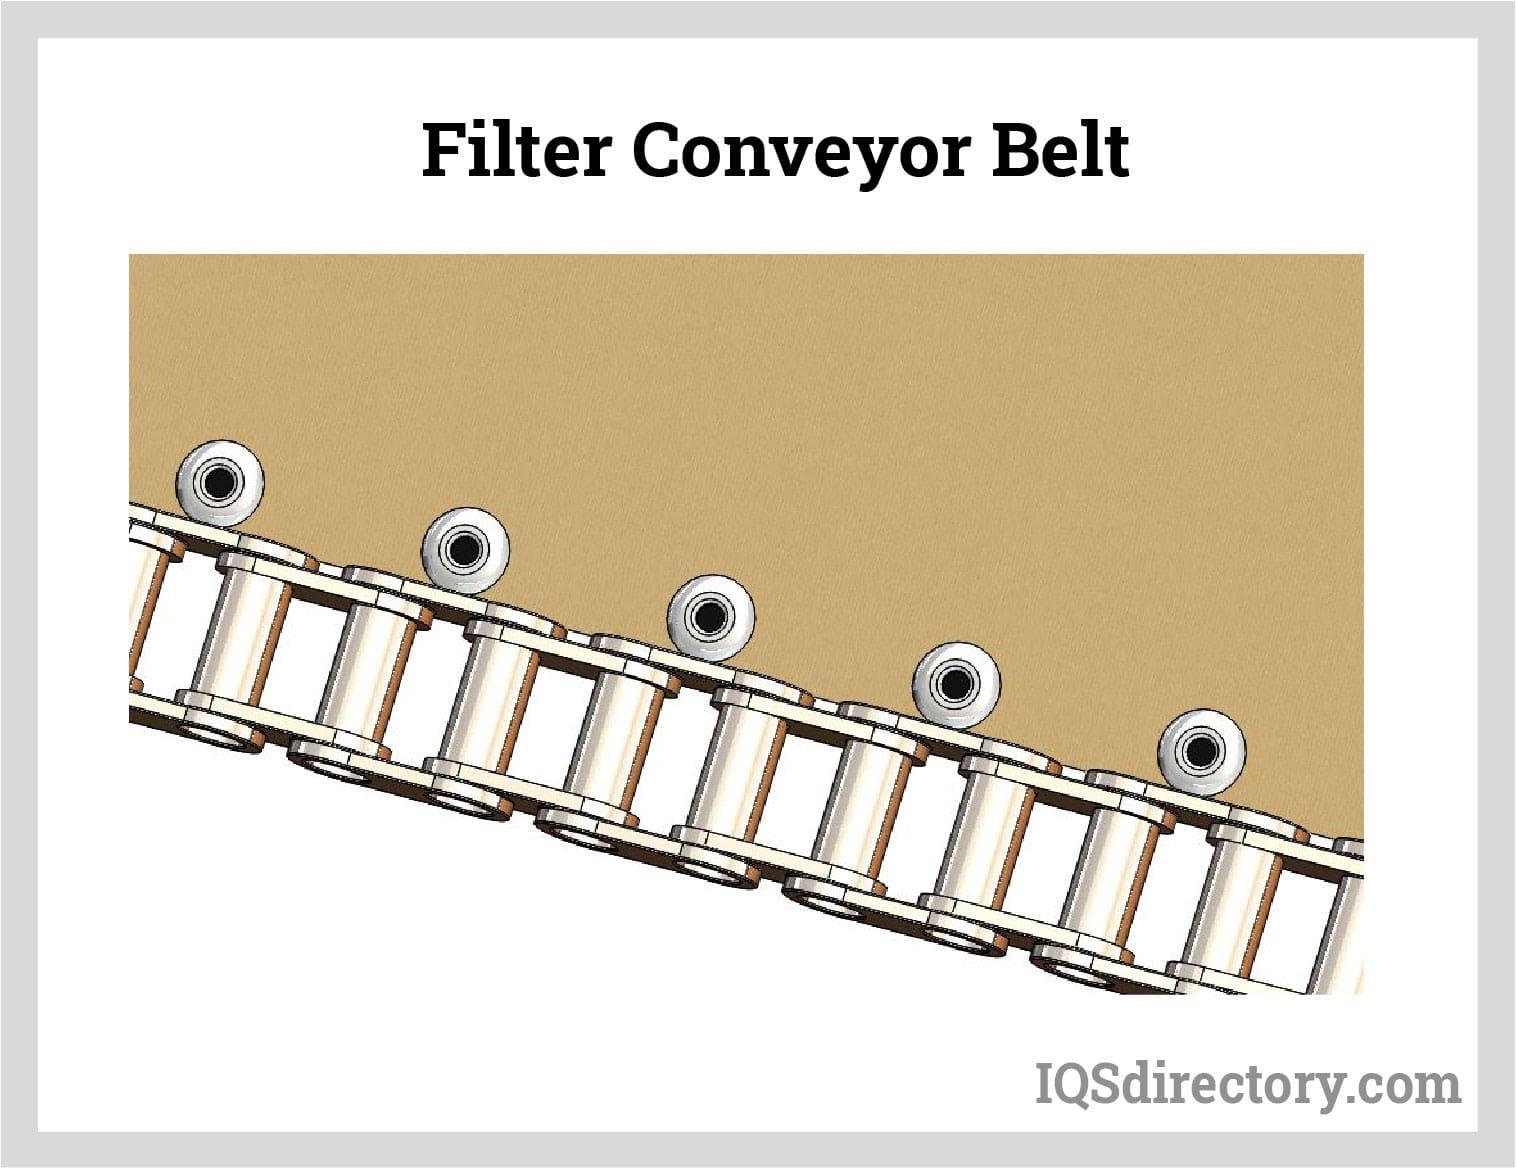 Filter Conveyor Belt